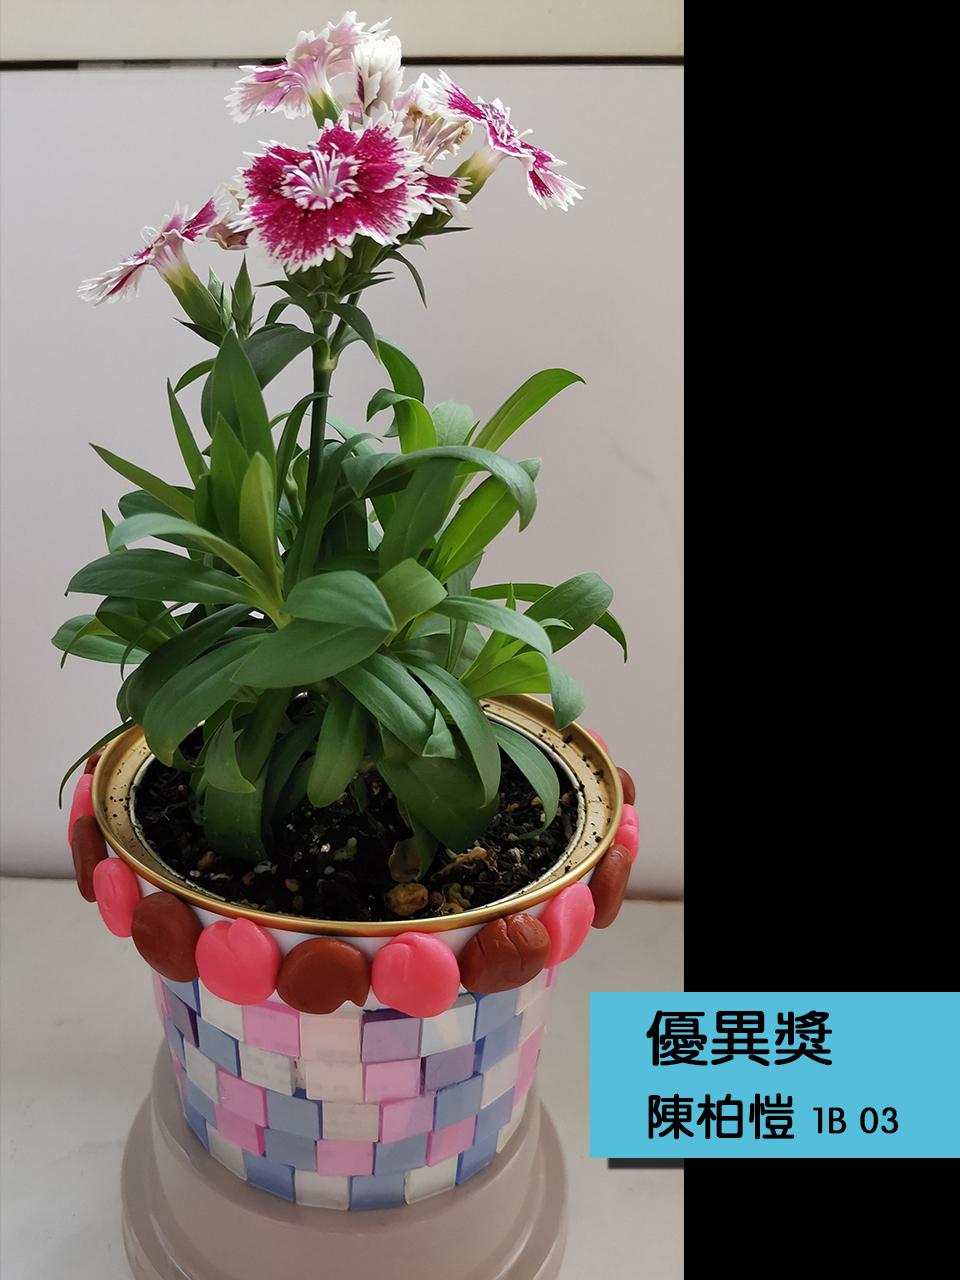 https://plkcjy.edu.hk/sites/default/files/you_yi_jiang_1b_03_chen_bo_kai_.jpg